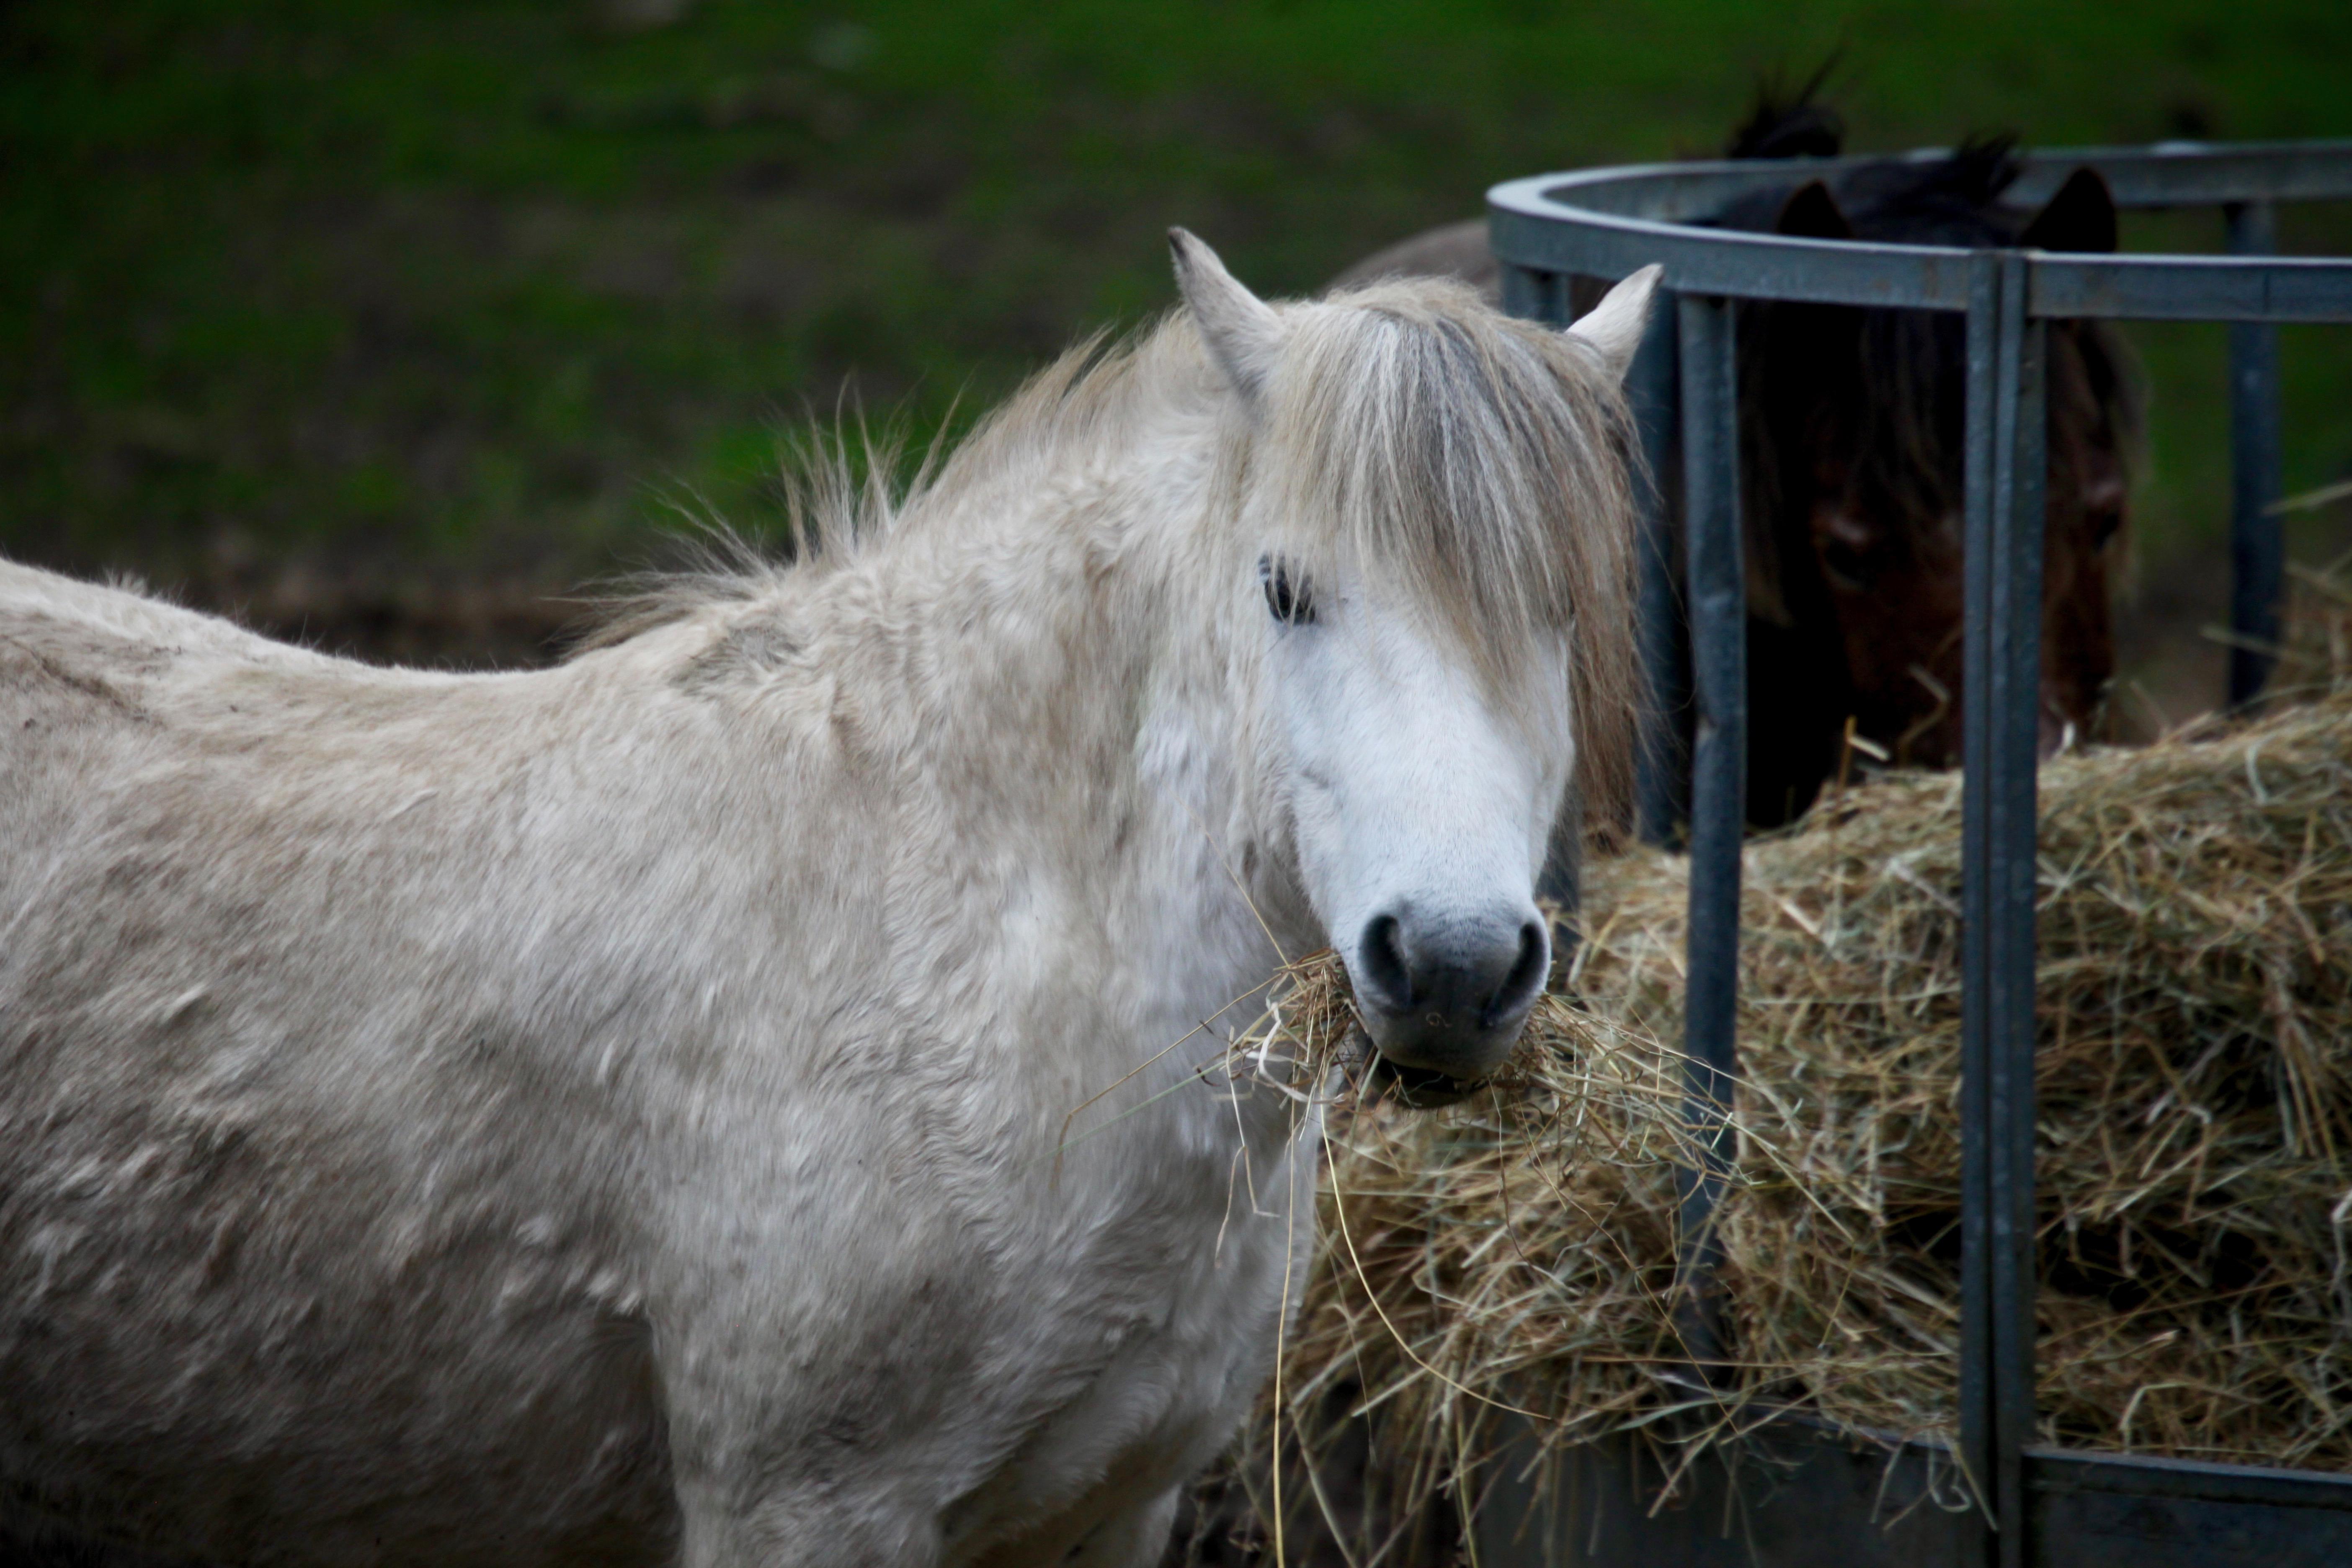 Pony eating hay 5